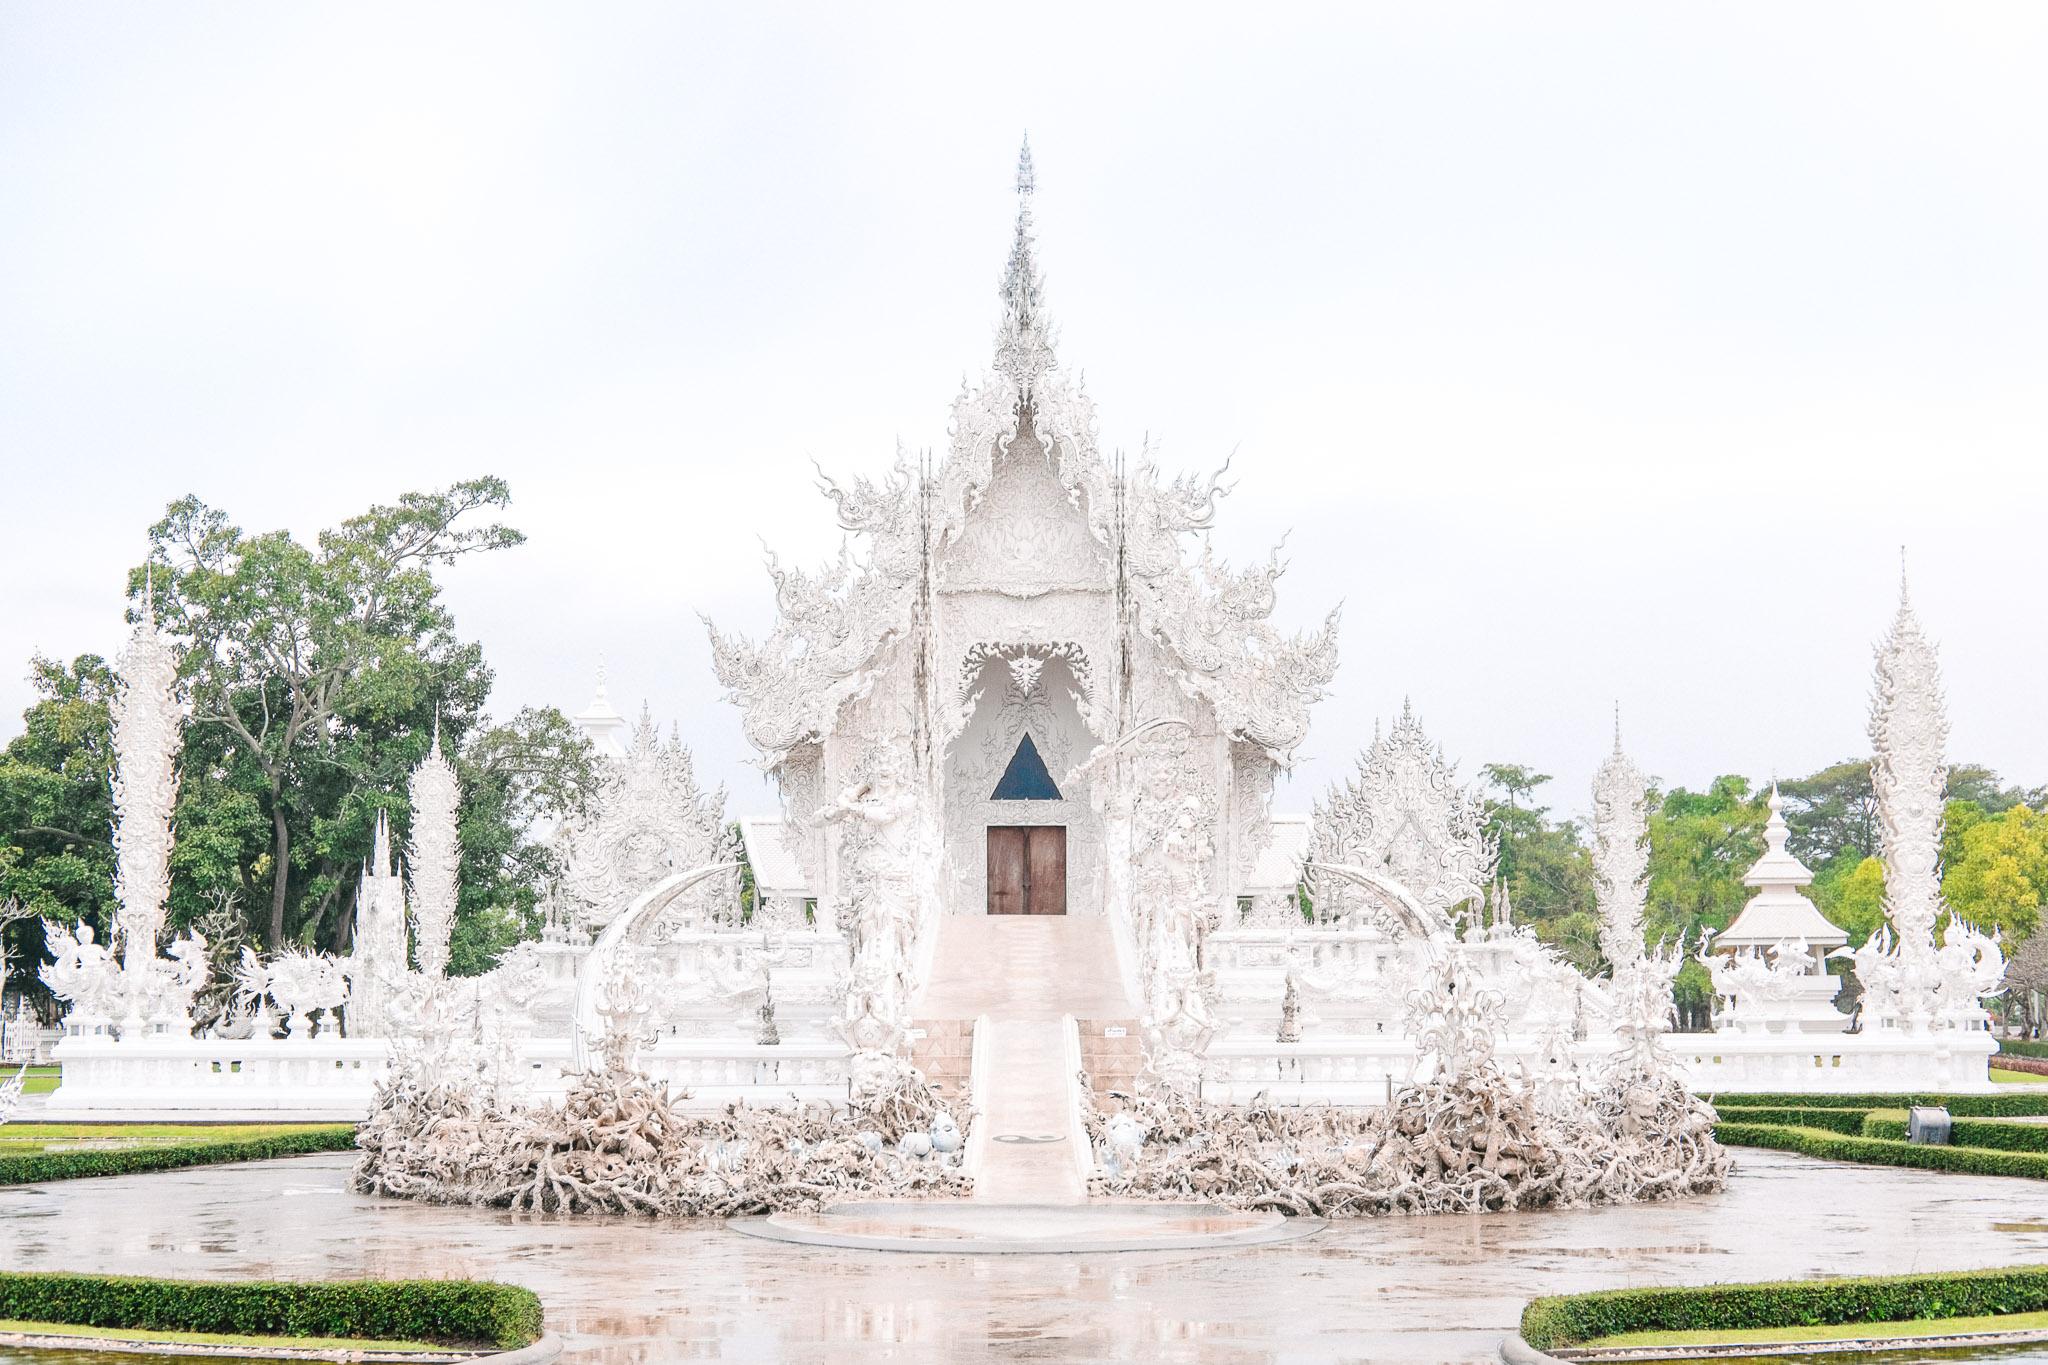 thailand-chiang-mai-wat-rong-khun-white-temple.jpg